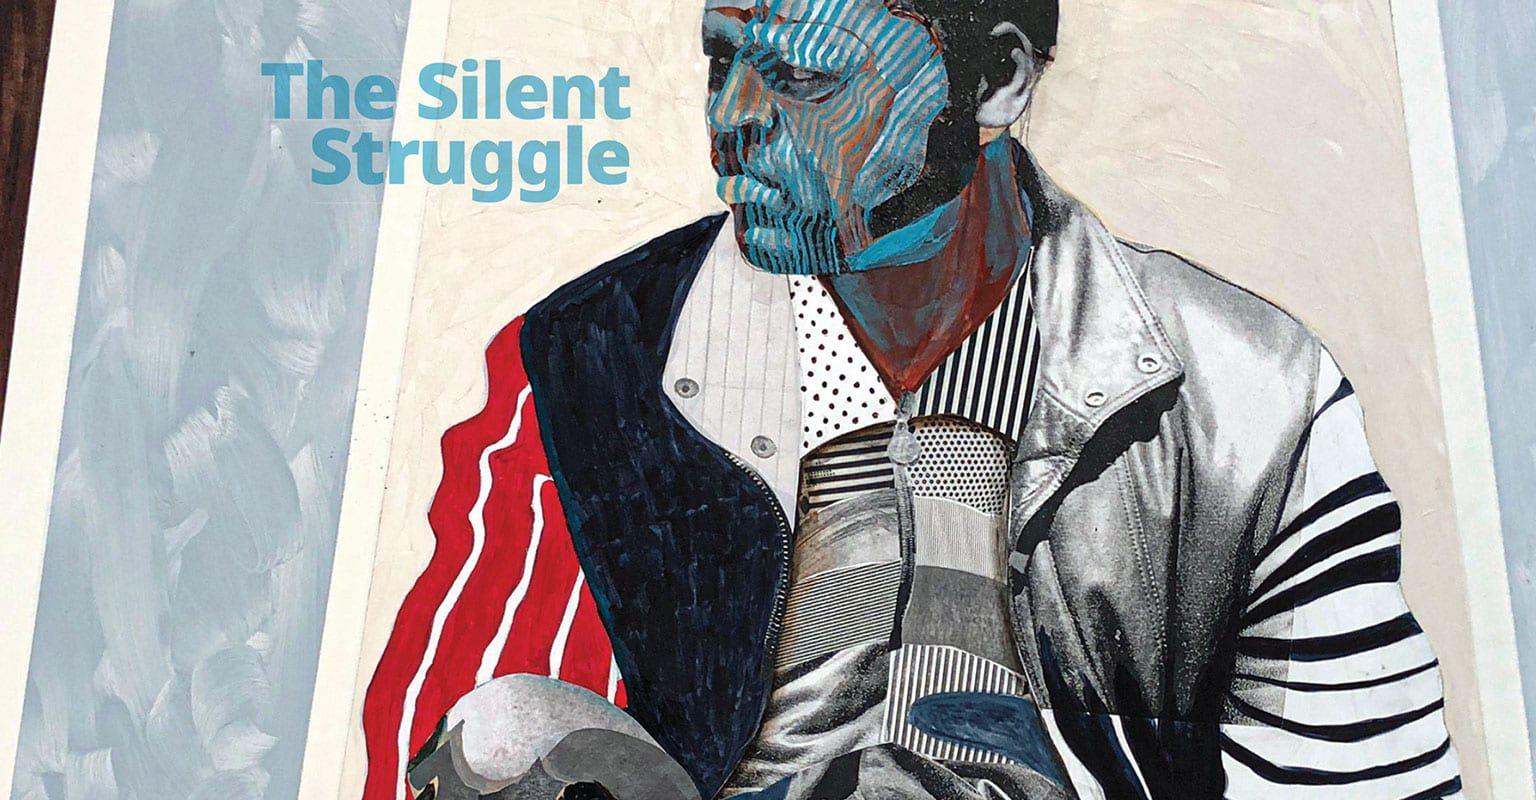 The Silent Struggle Cover: The Silent Struggle; Artist: Jerry Butler